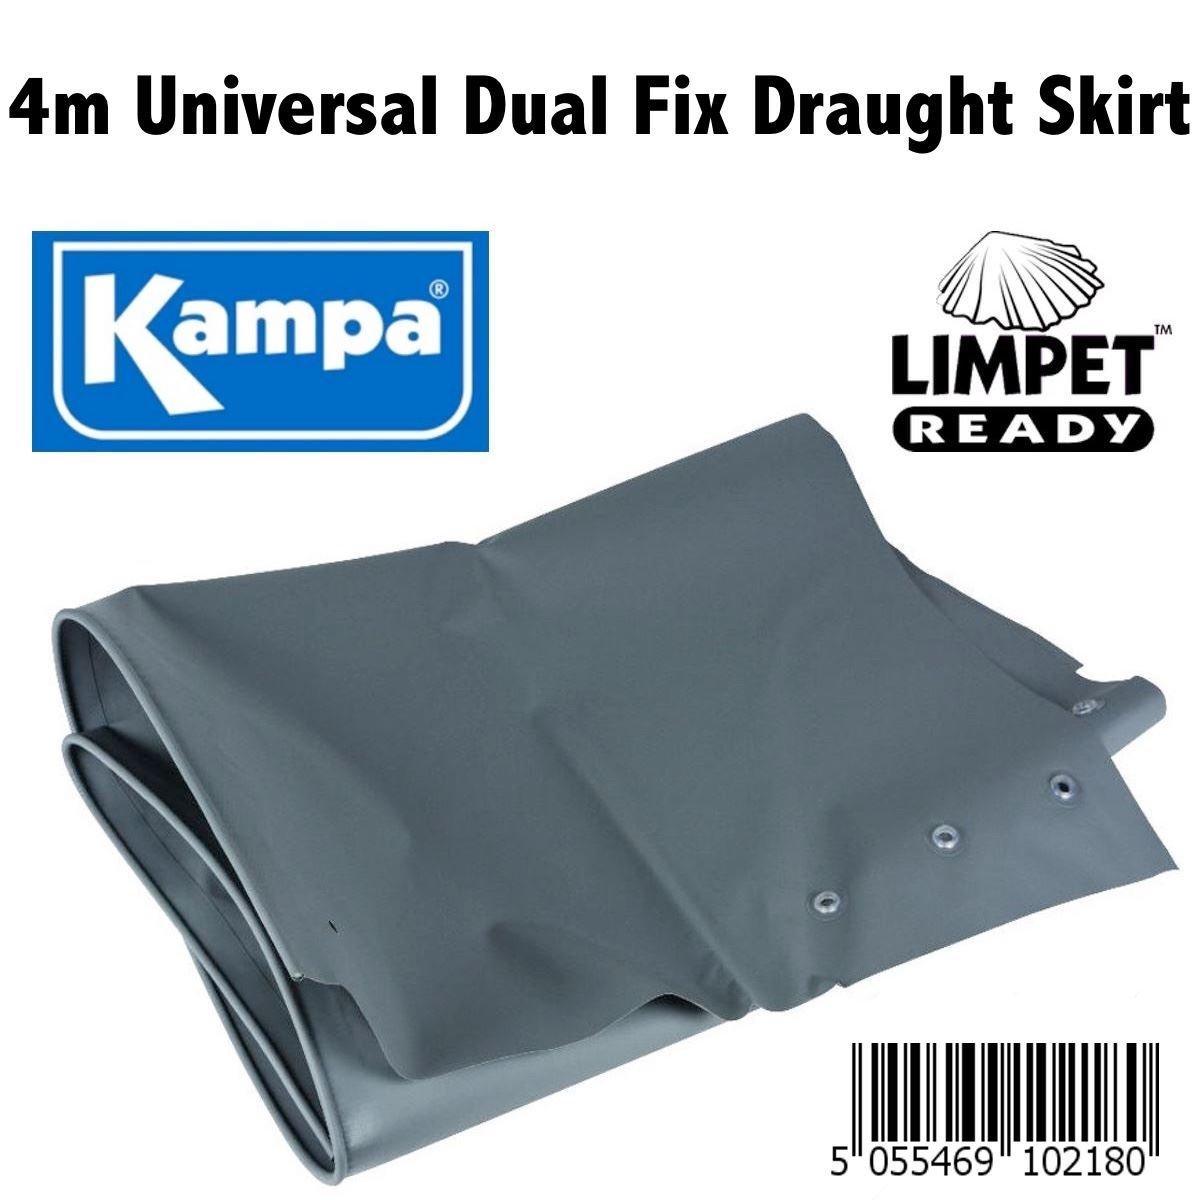 Kampa Draught Skirt 4m x 70cm Universal Caravan & Motorhome - Limpet Ready